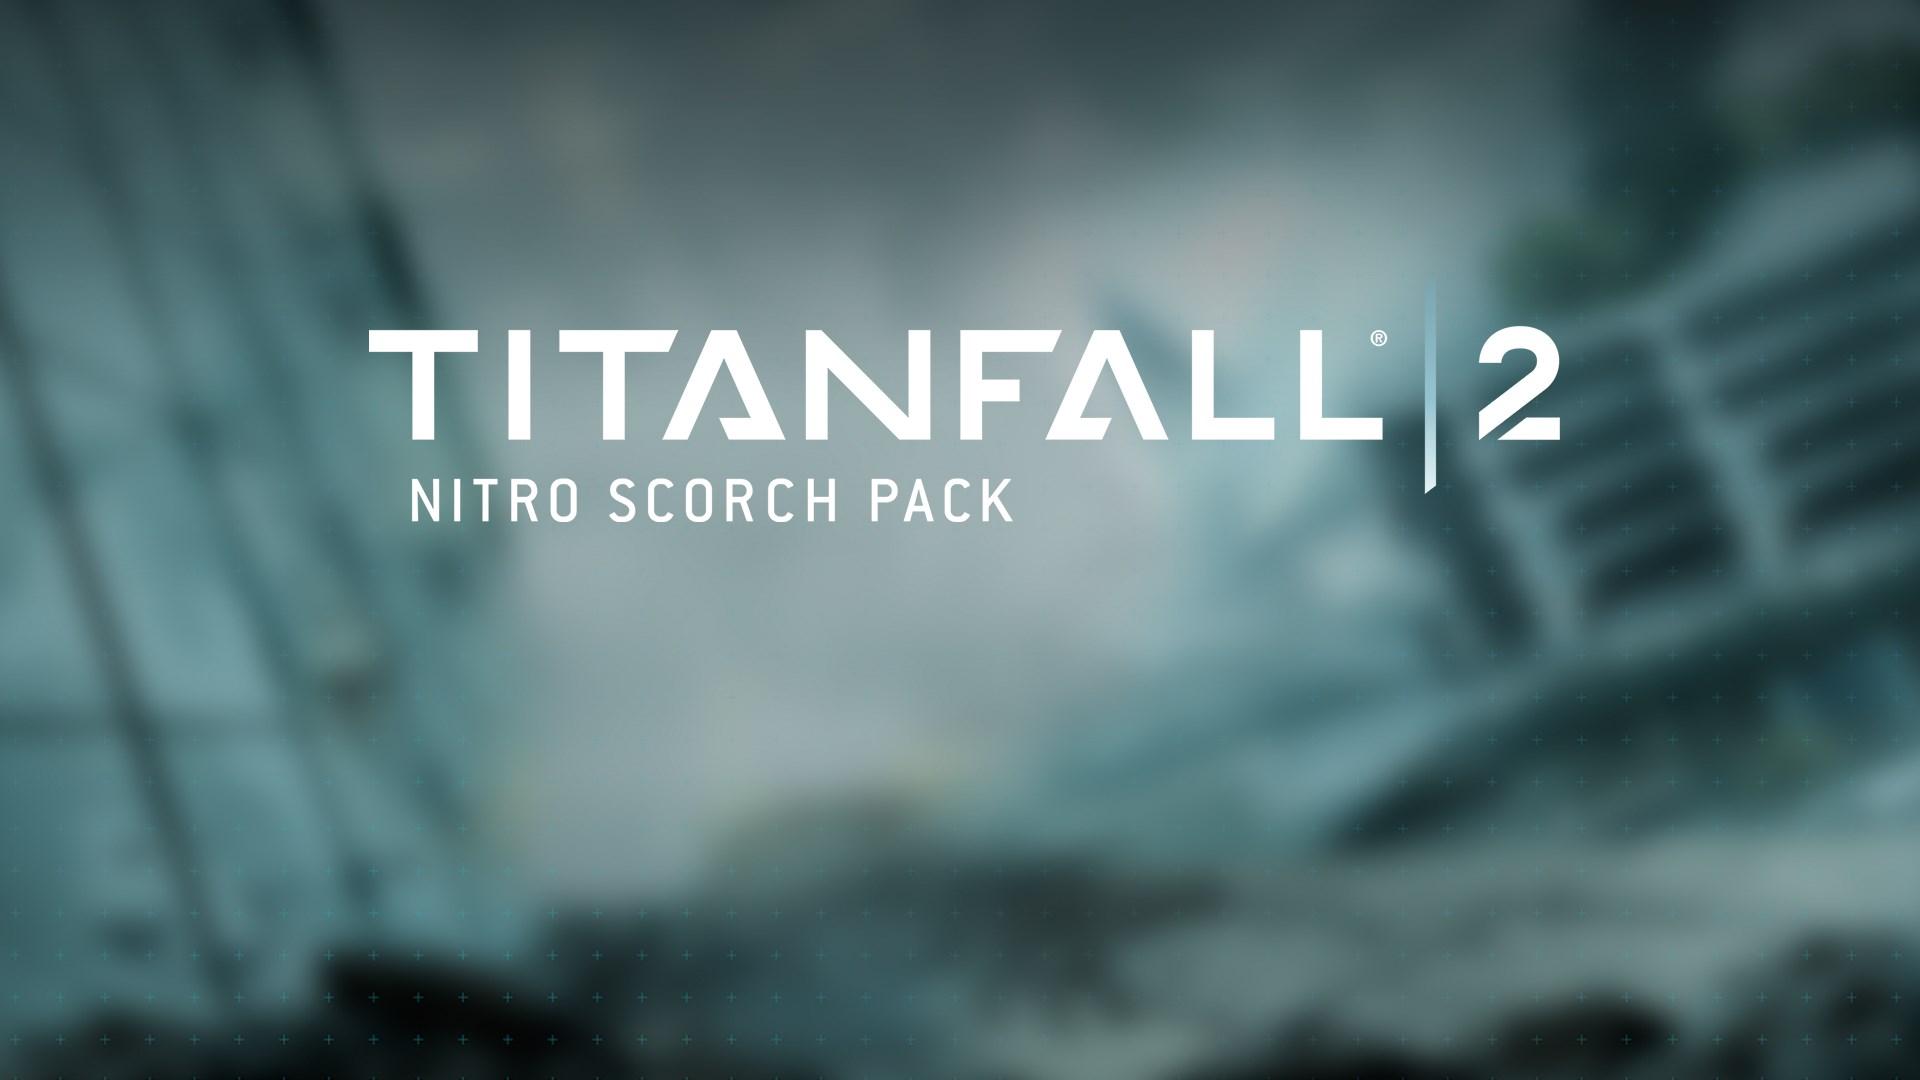 Buy Titanfall® 2 Nitro Scorch Pack - Microsoft Store